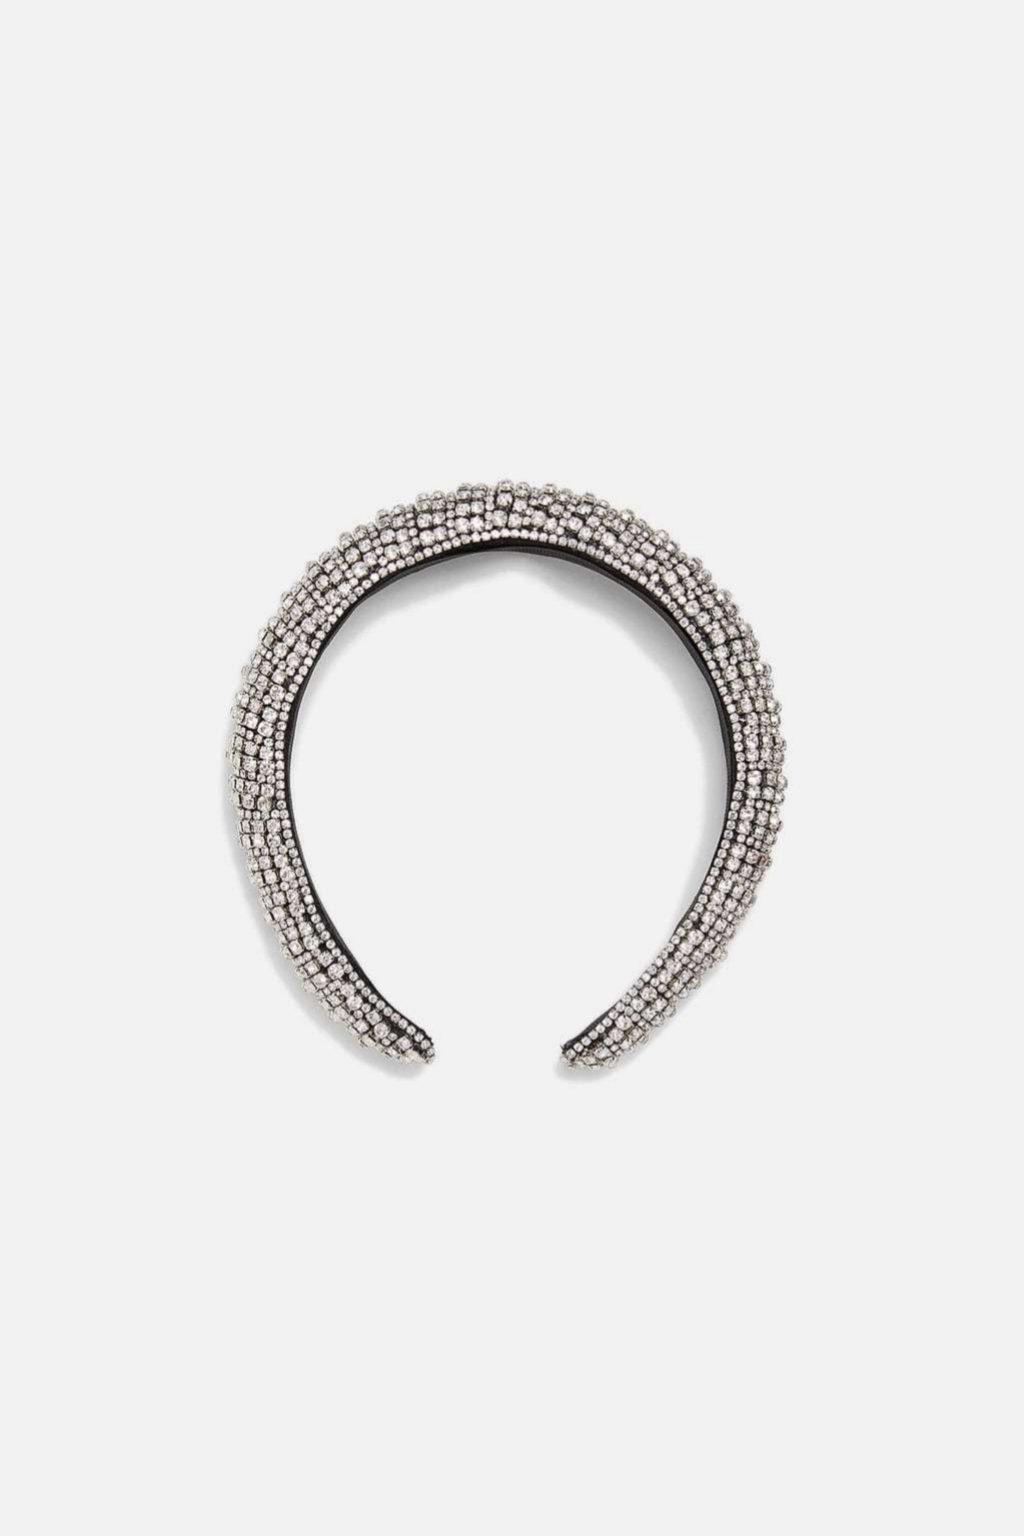 Diadema de brillos de Edición Limitada de Zara